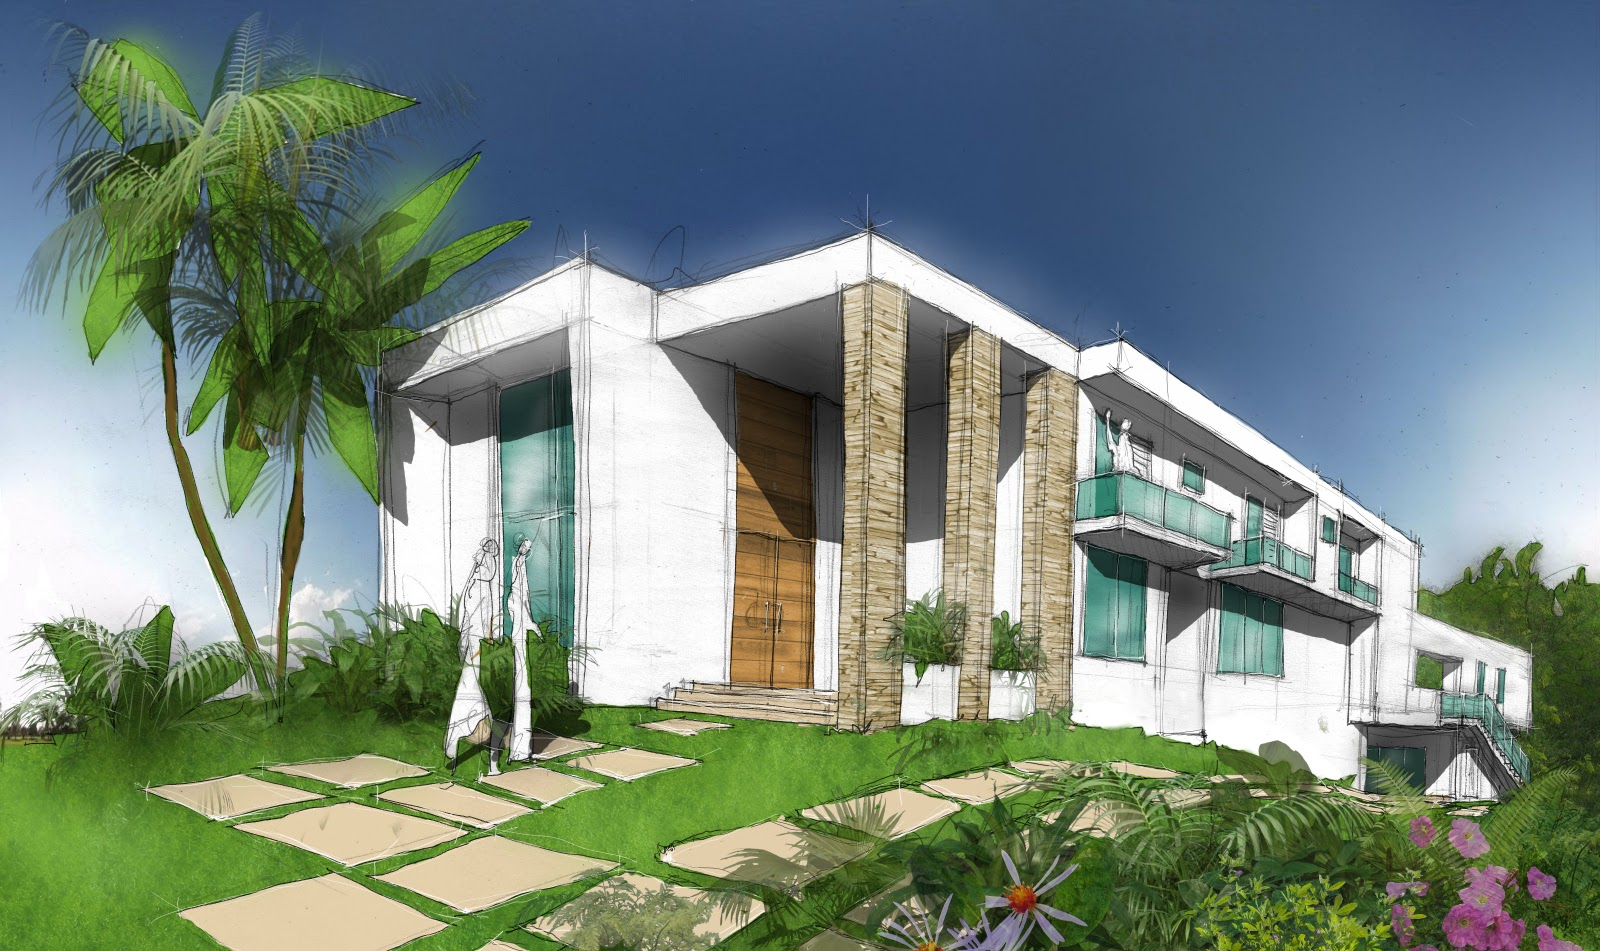 Fotos de fachadas de casas modernas e bonitas decorando - Casas rusticas modernas fotos ...